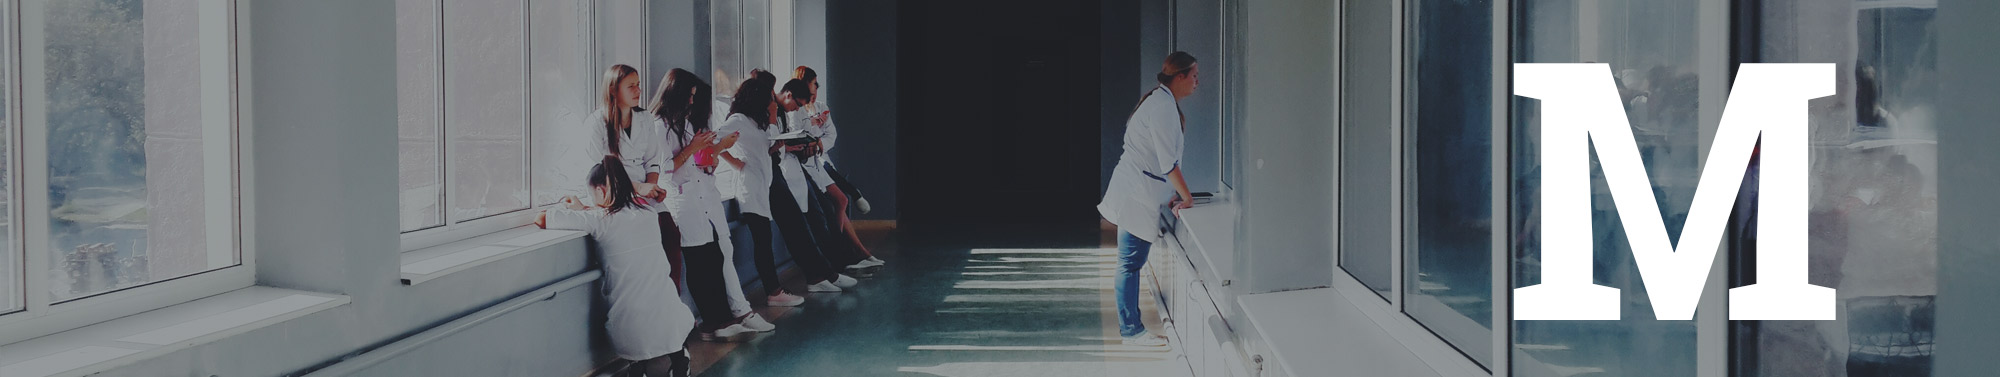 medical-iig-insurance